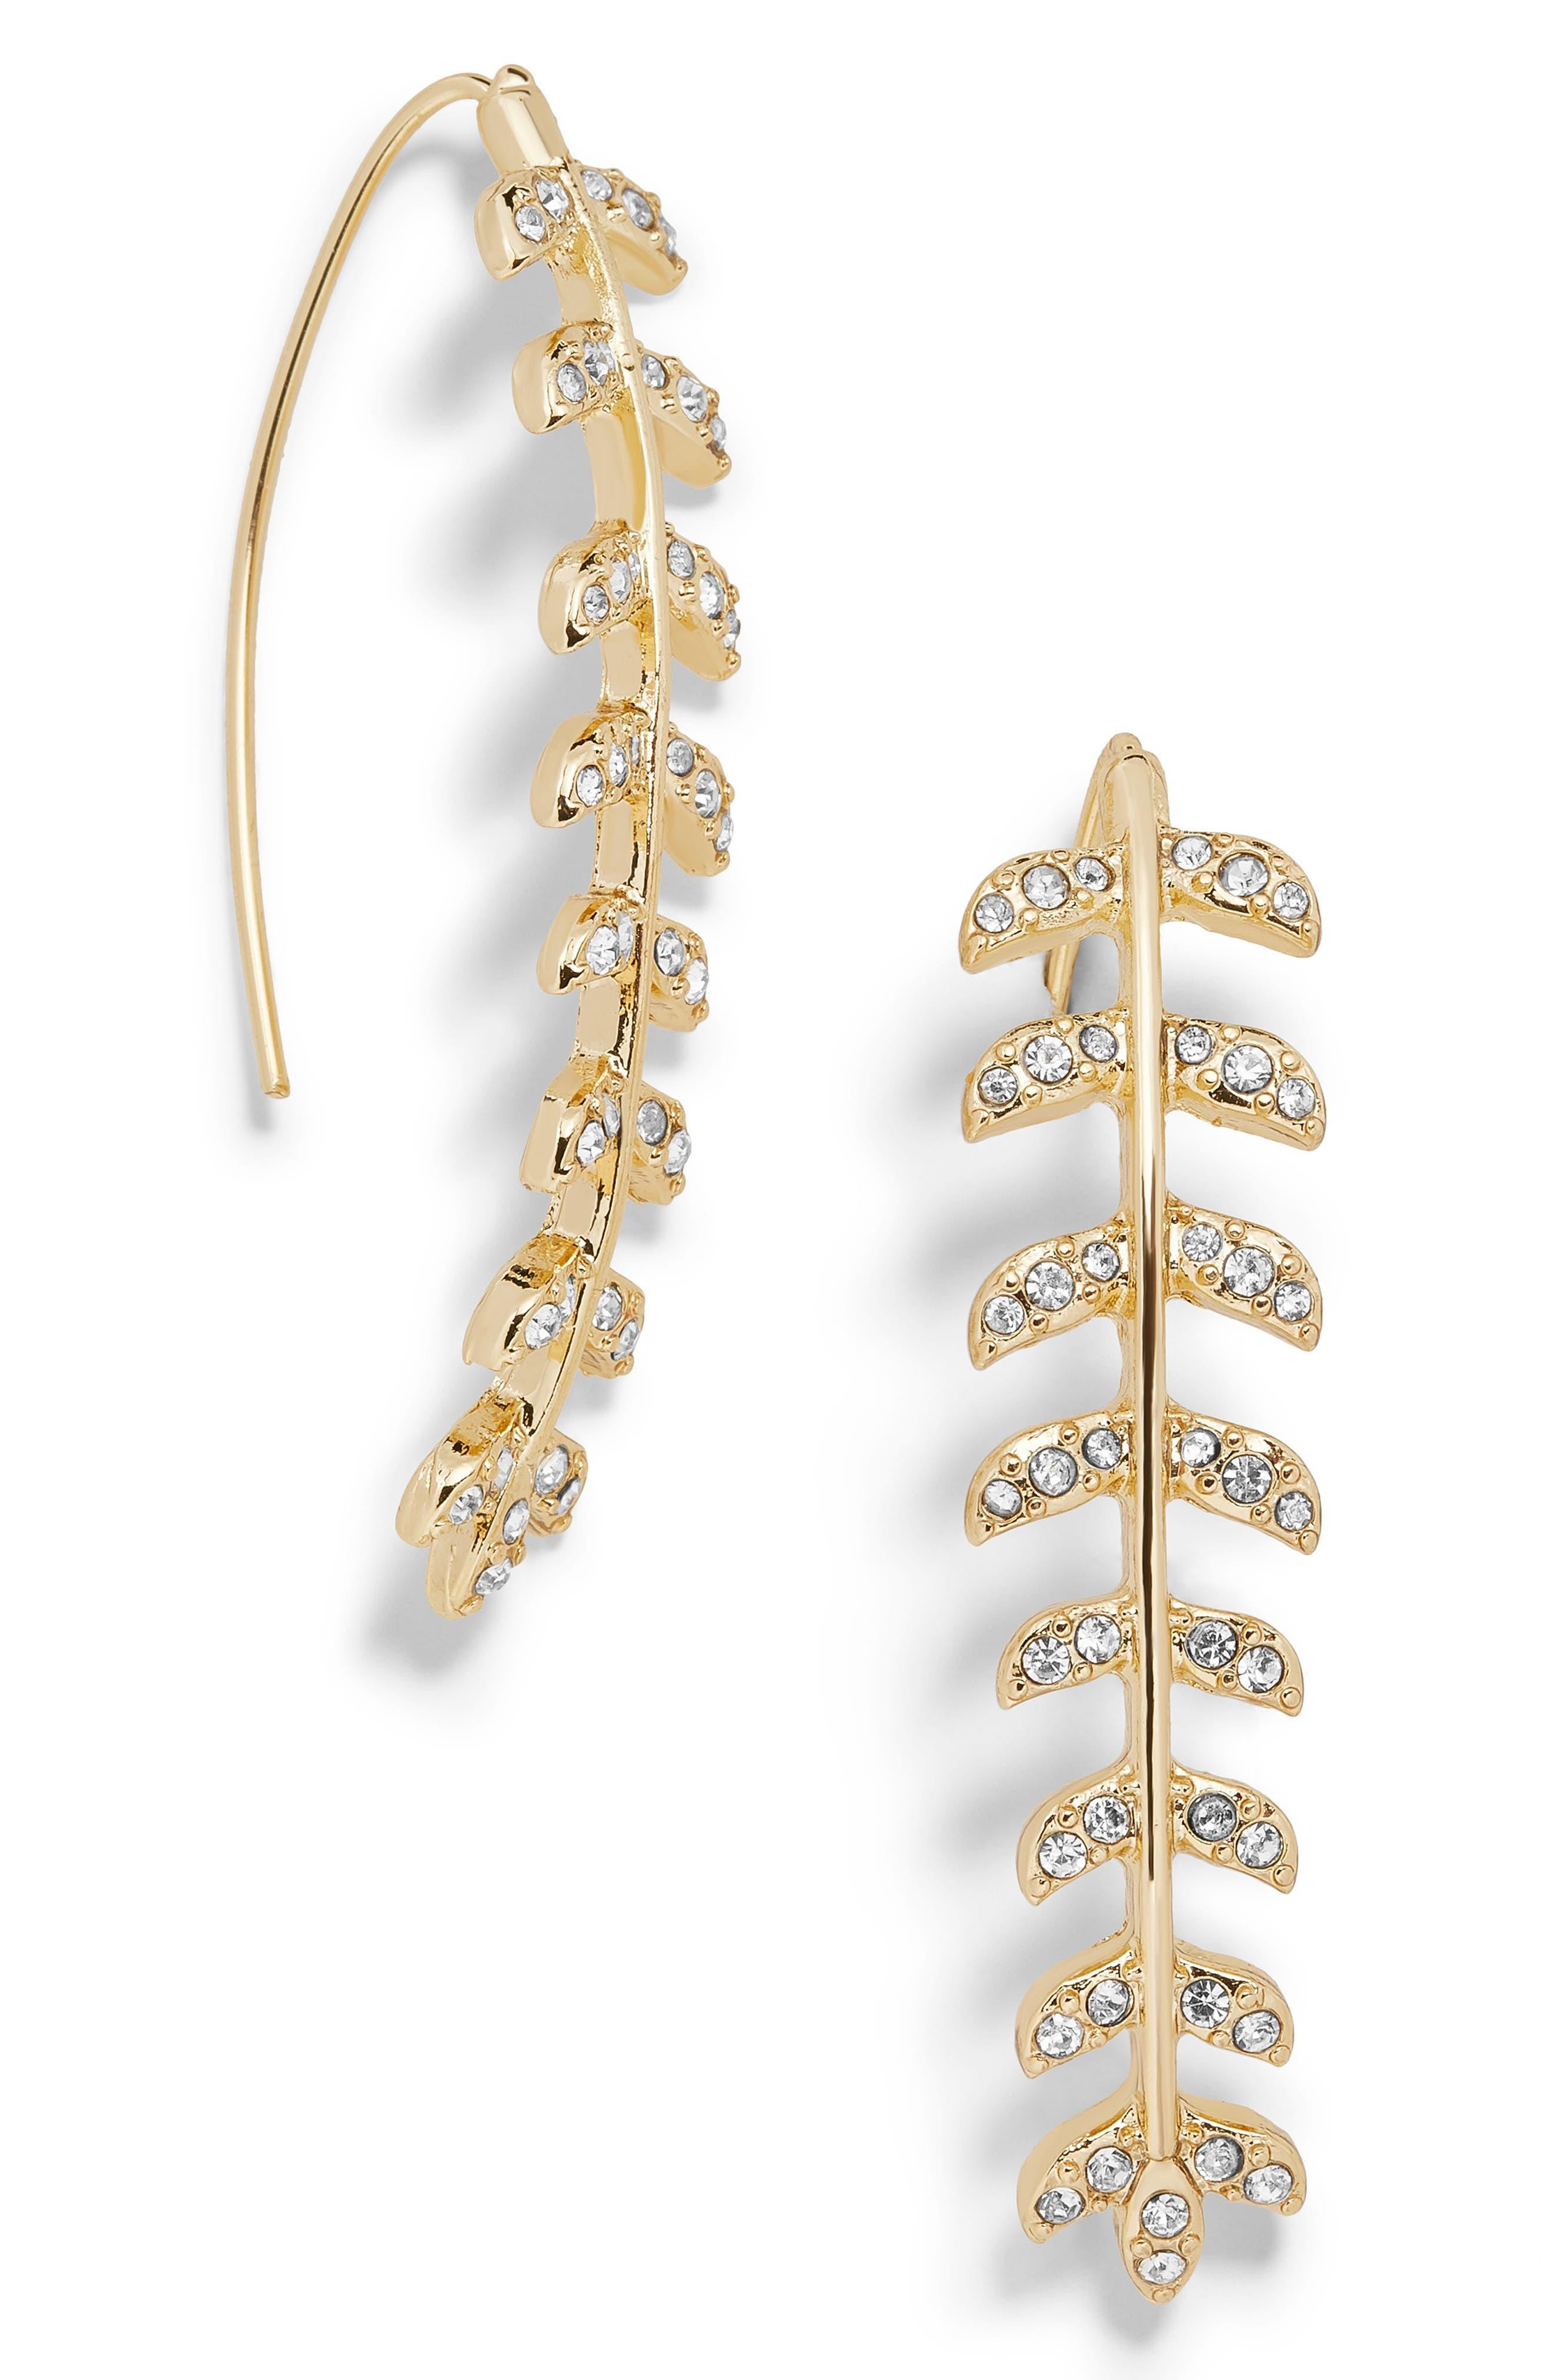 BAUBLEBAR Celosia Crystal Drop Earrings, Main, color, GOLD